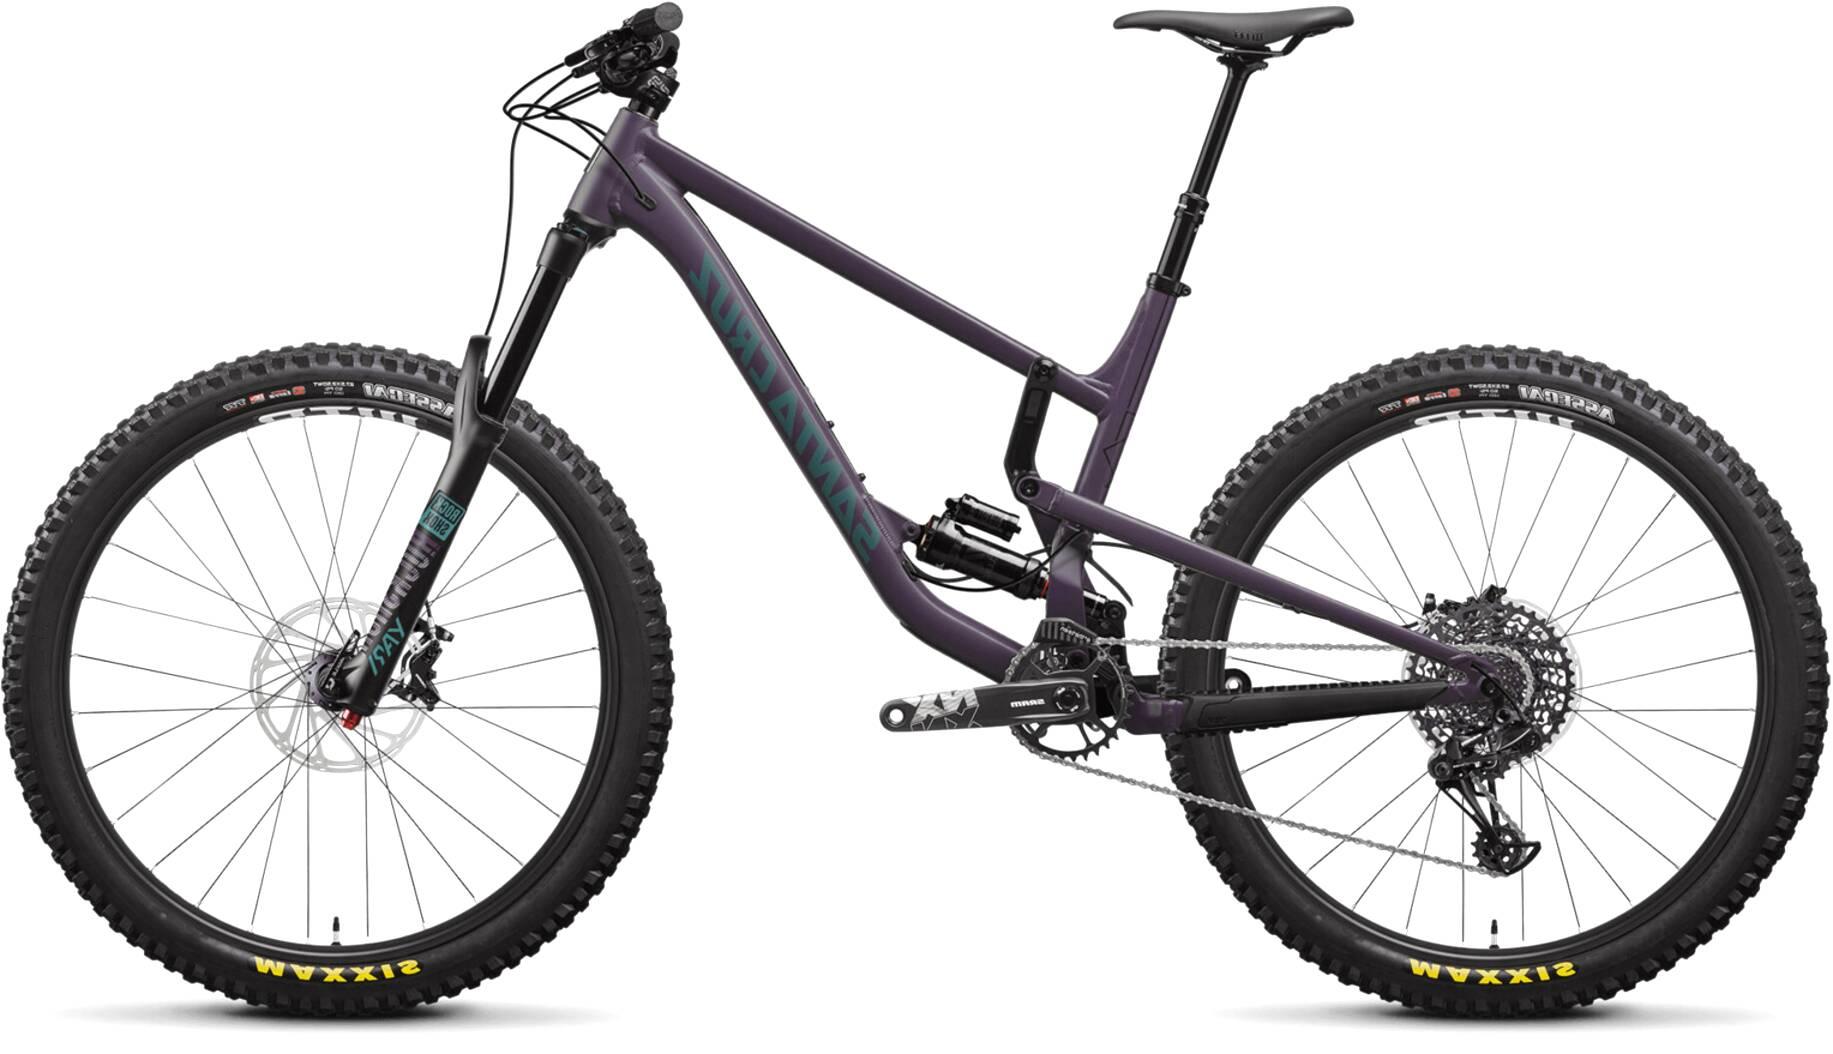 Santa Cruz Nomad for sale compared to CraigsList   Only 4 ...